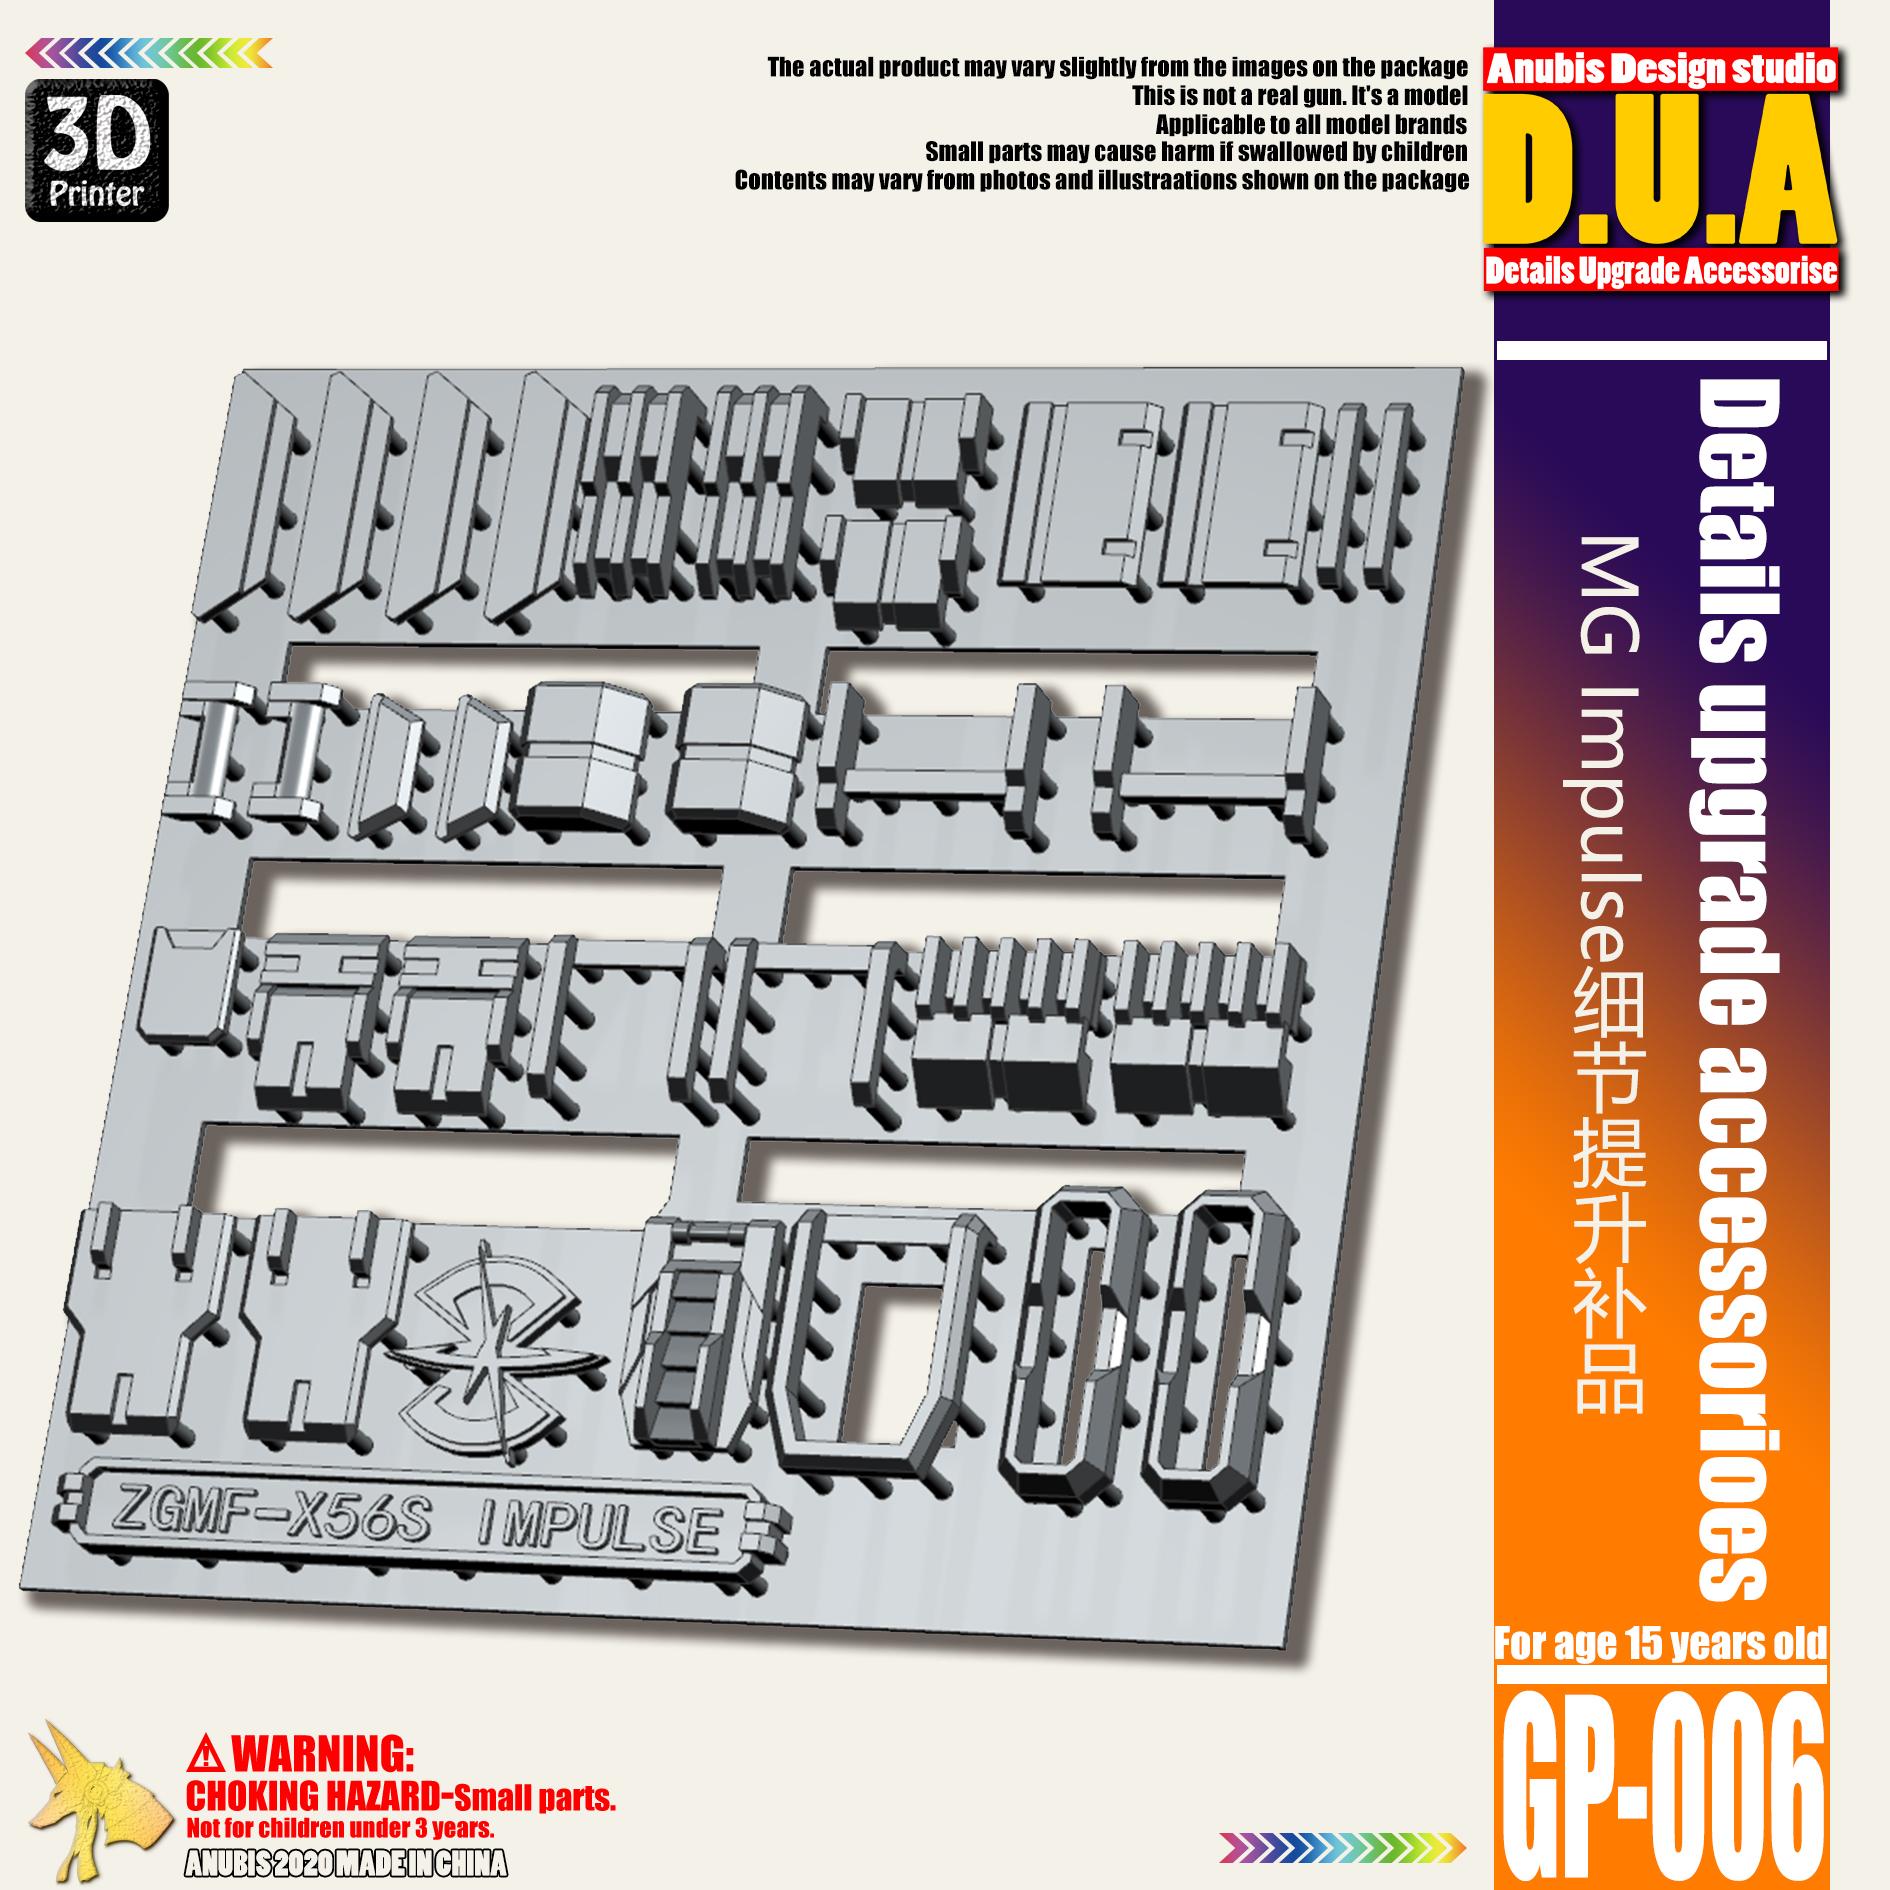 G535_GP006_MG_impulse_005.jpg